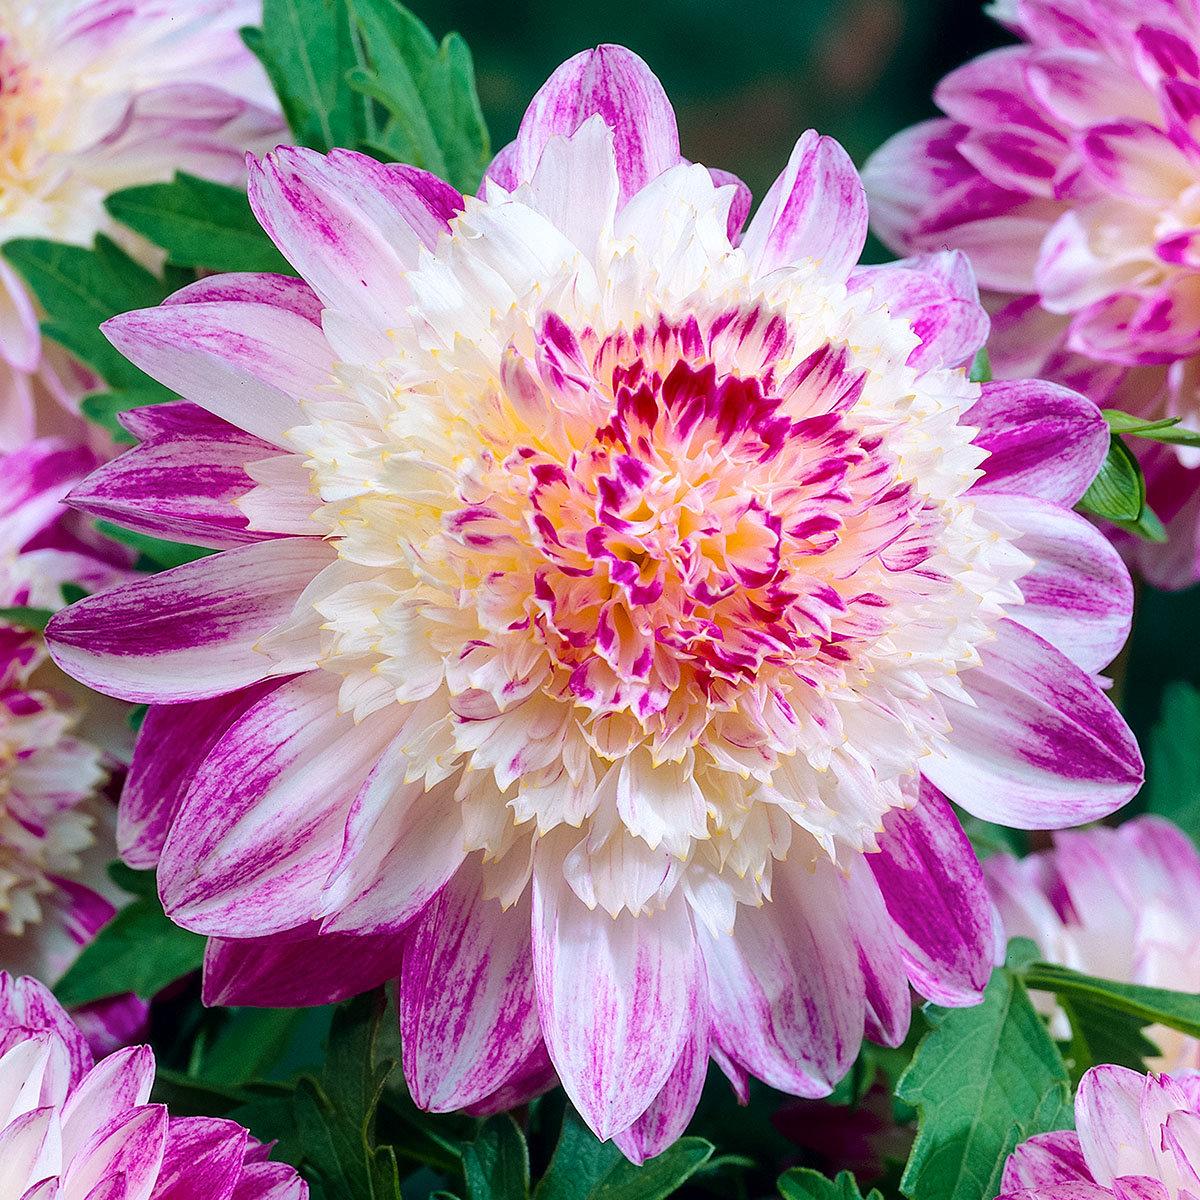 Anemonenblütige Dahlie Que Sera